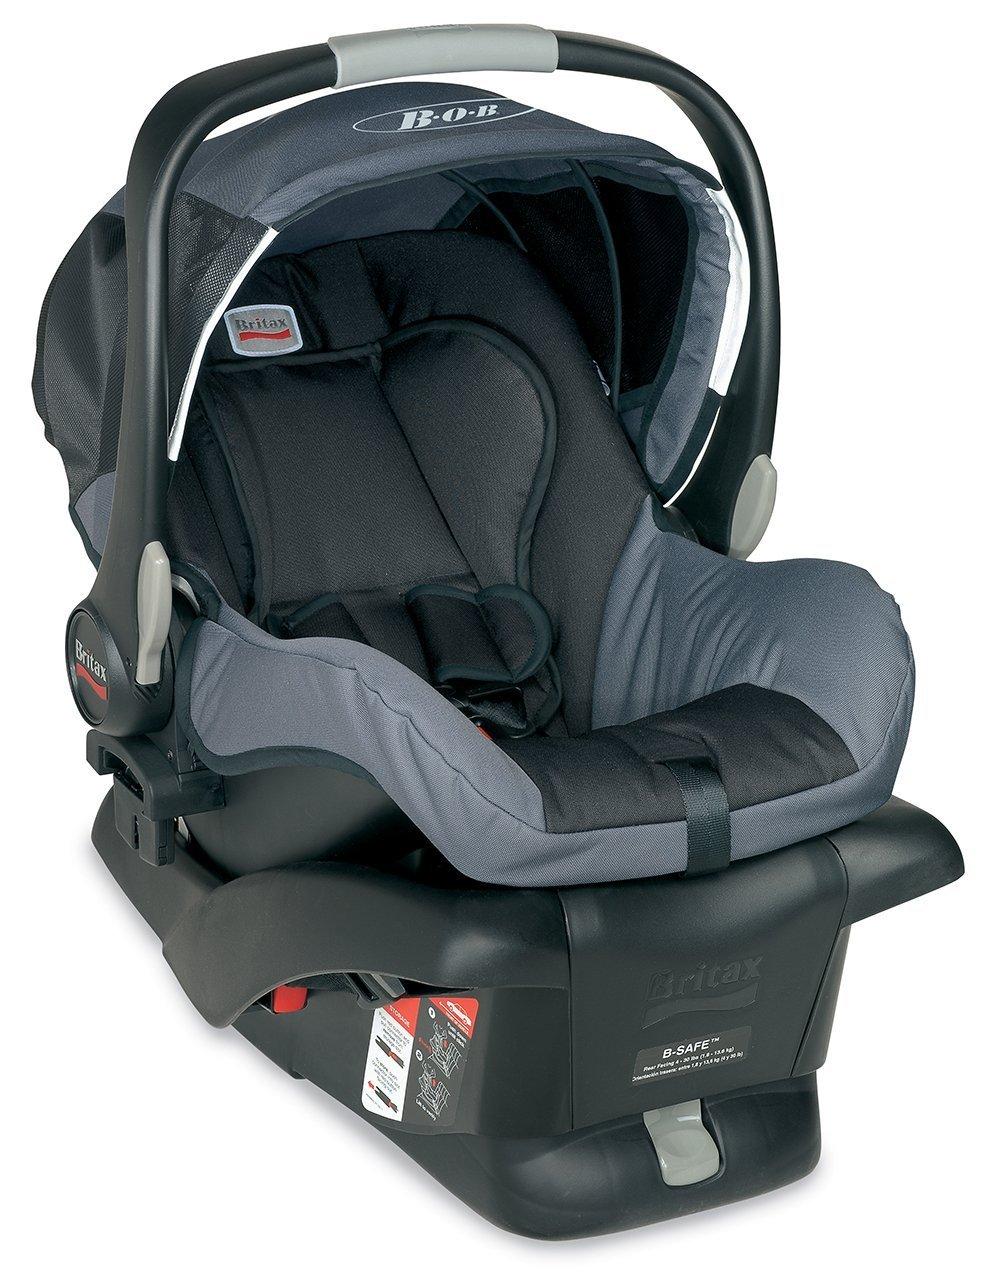 Bob B-Safe Infant Car Seat, Black Britax E9LF34A